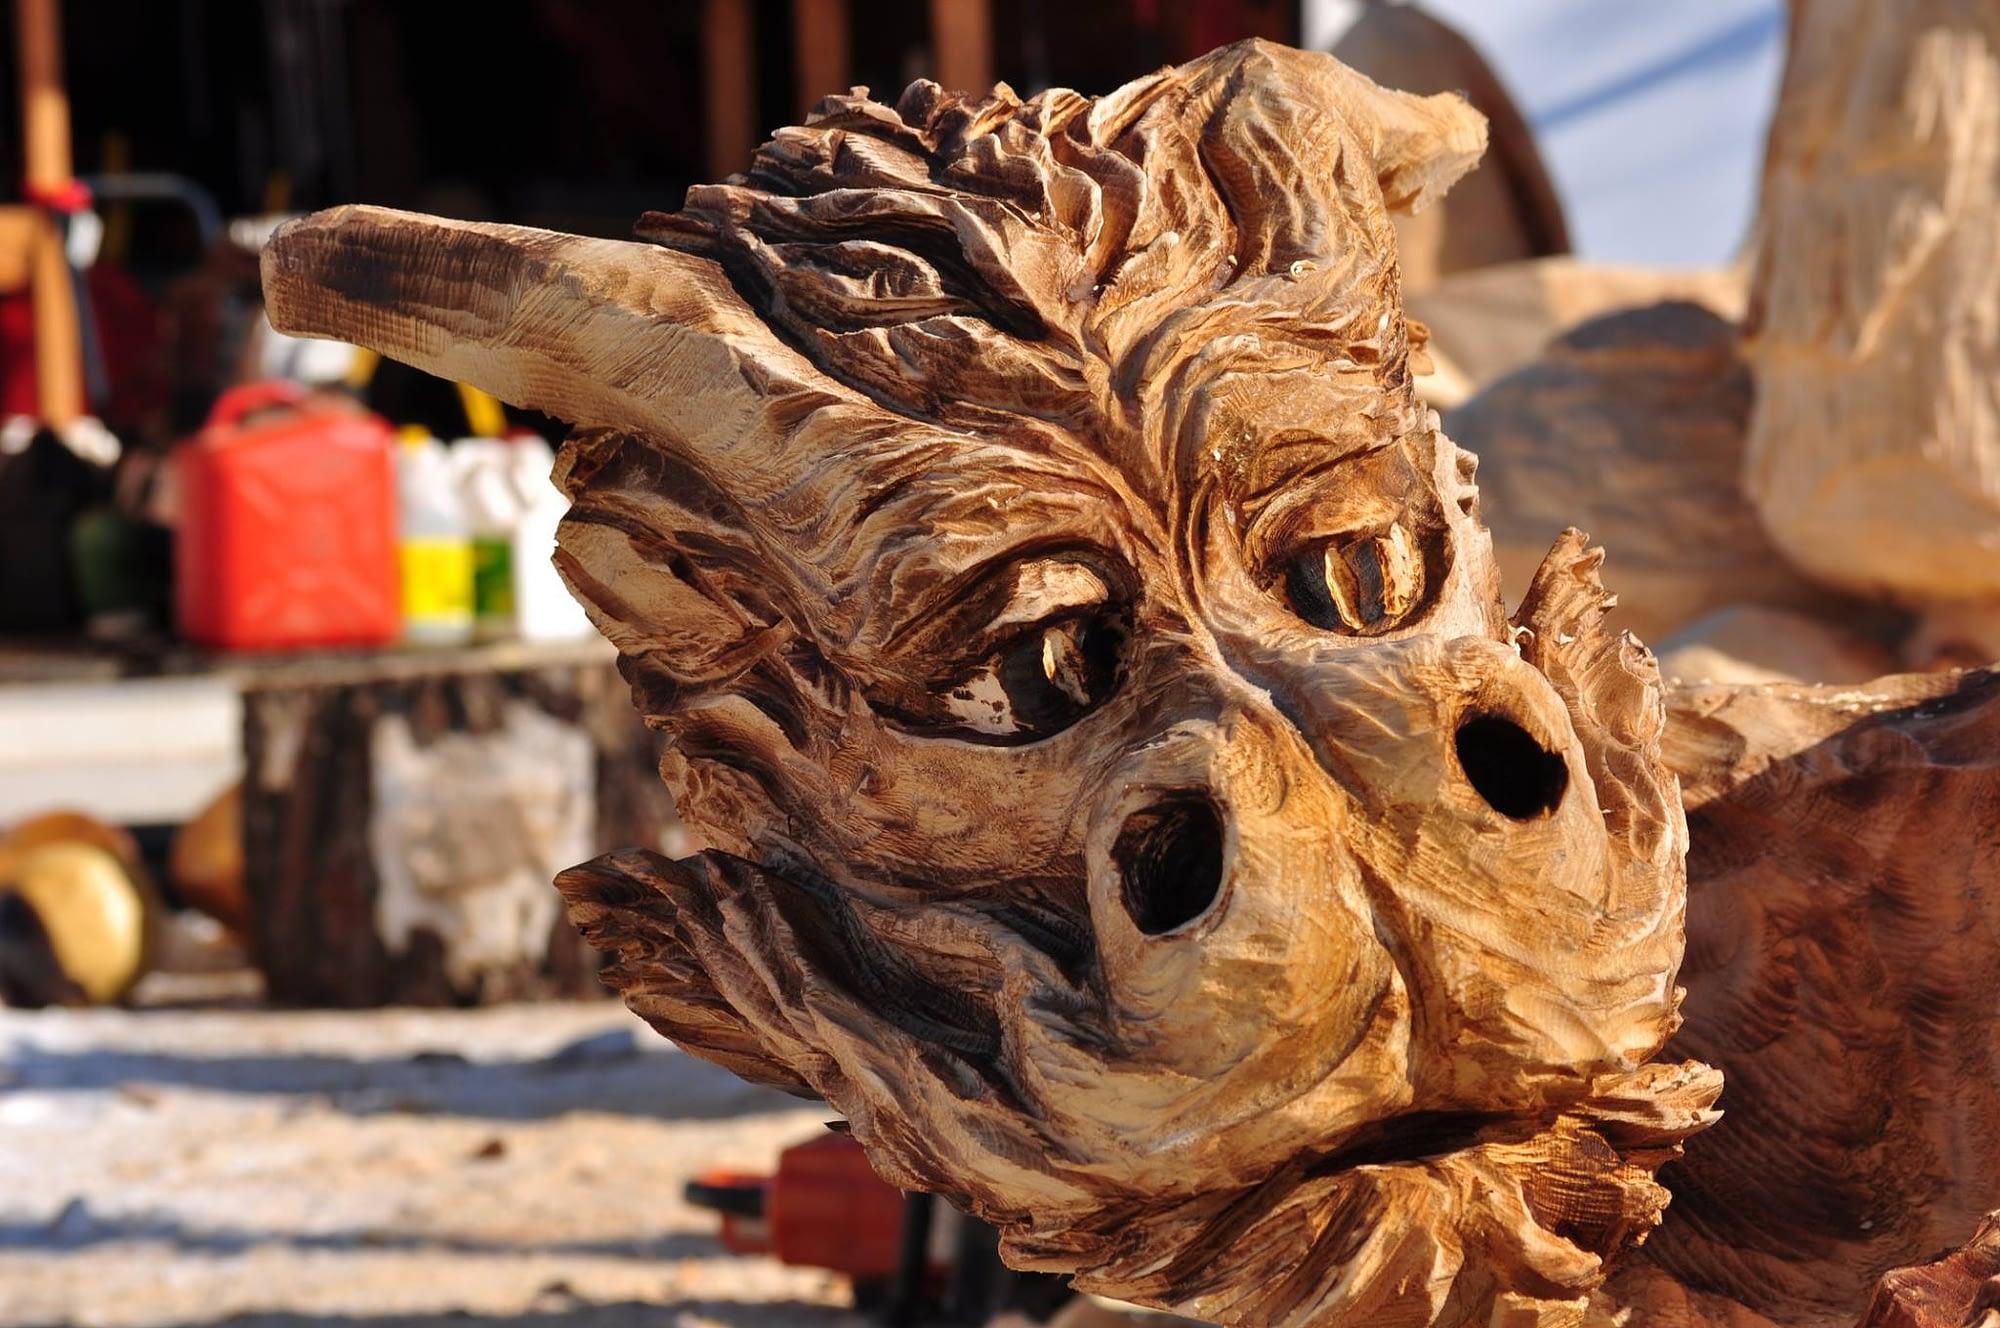 Carving, Dragon, Bench